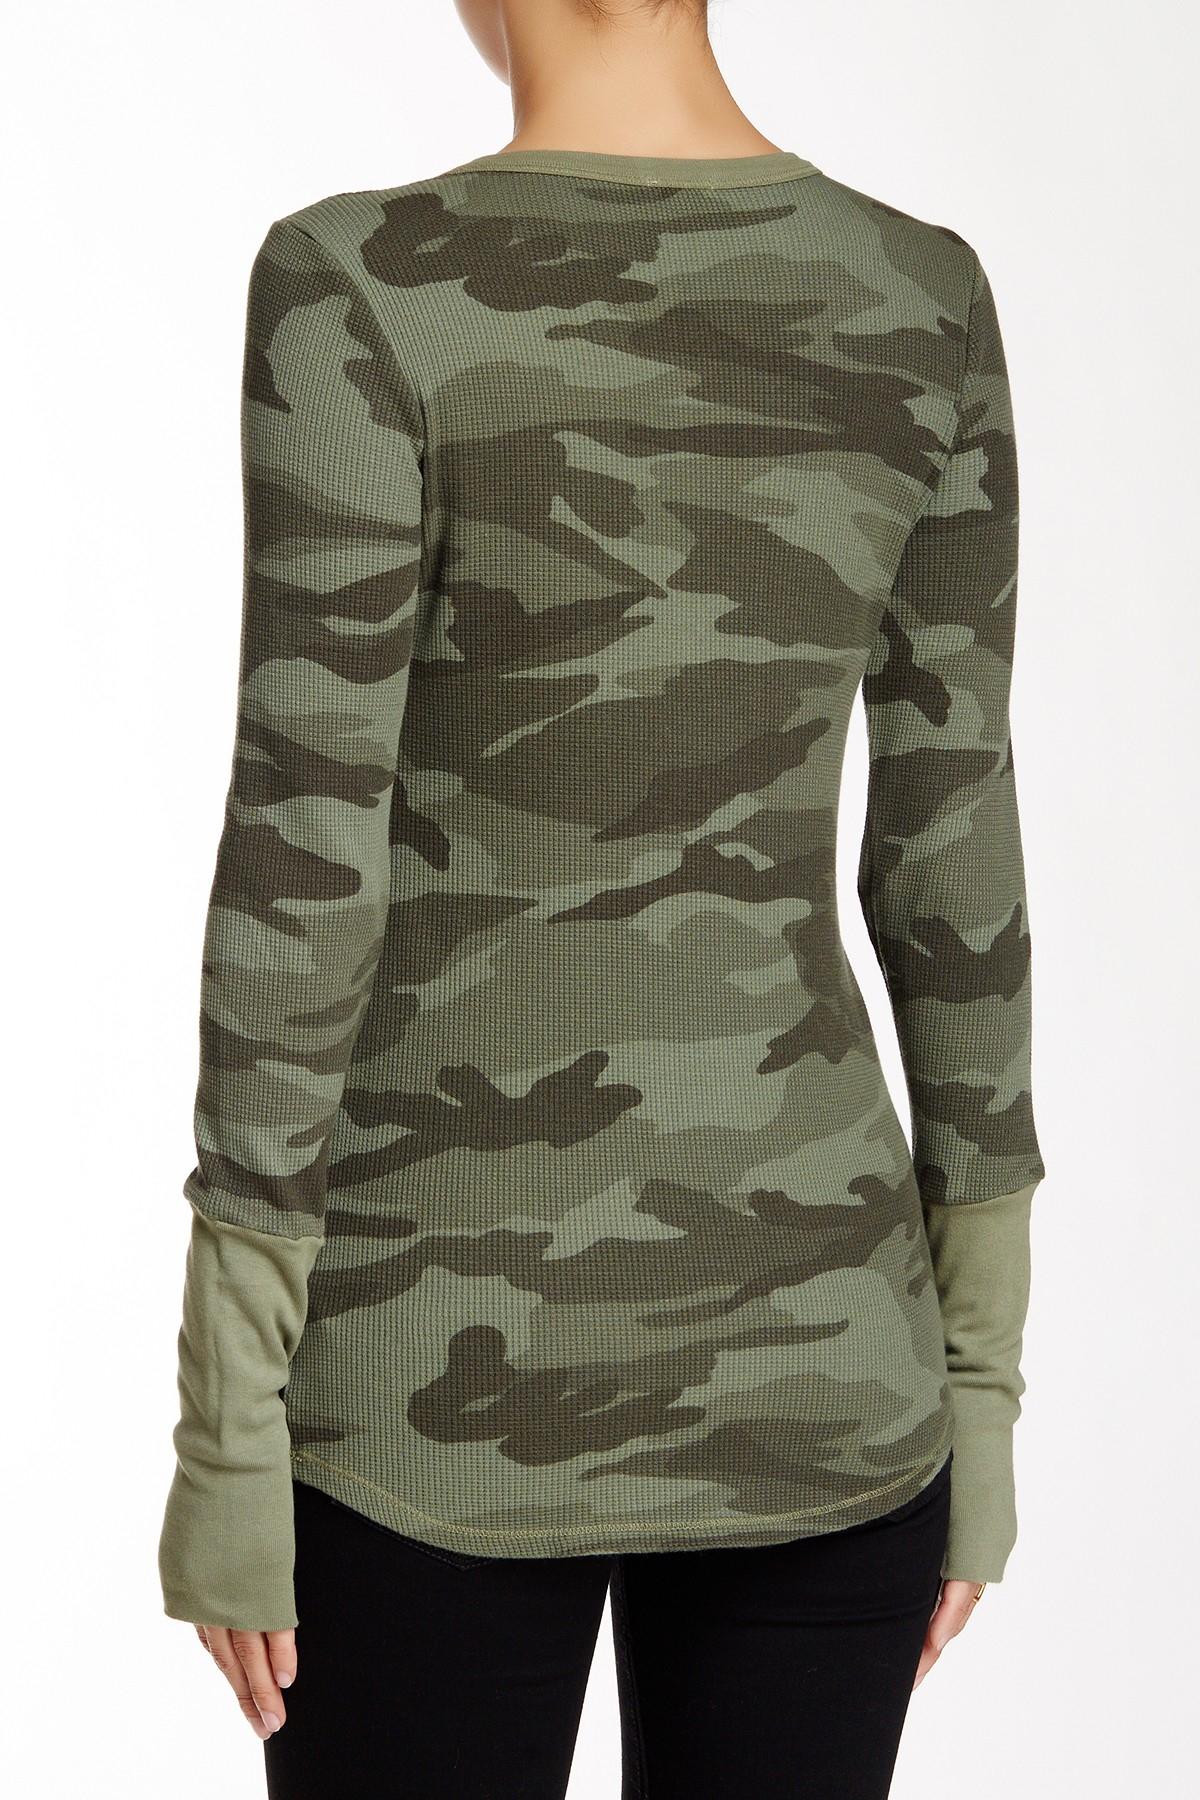 Camouflage T Shirts Women